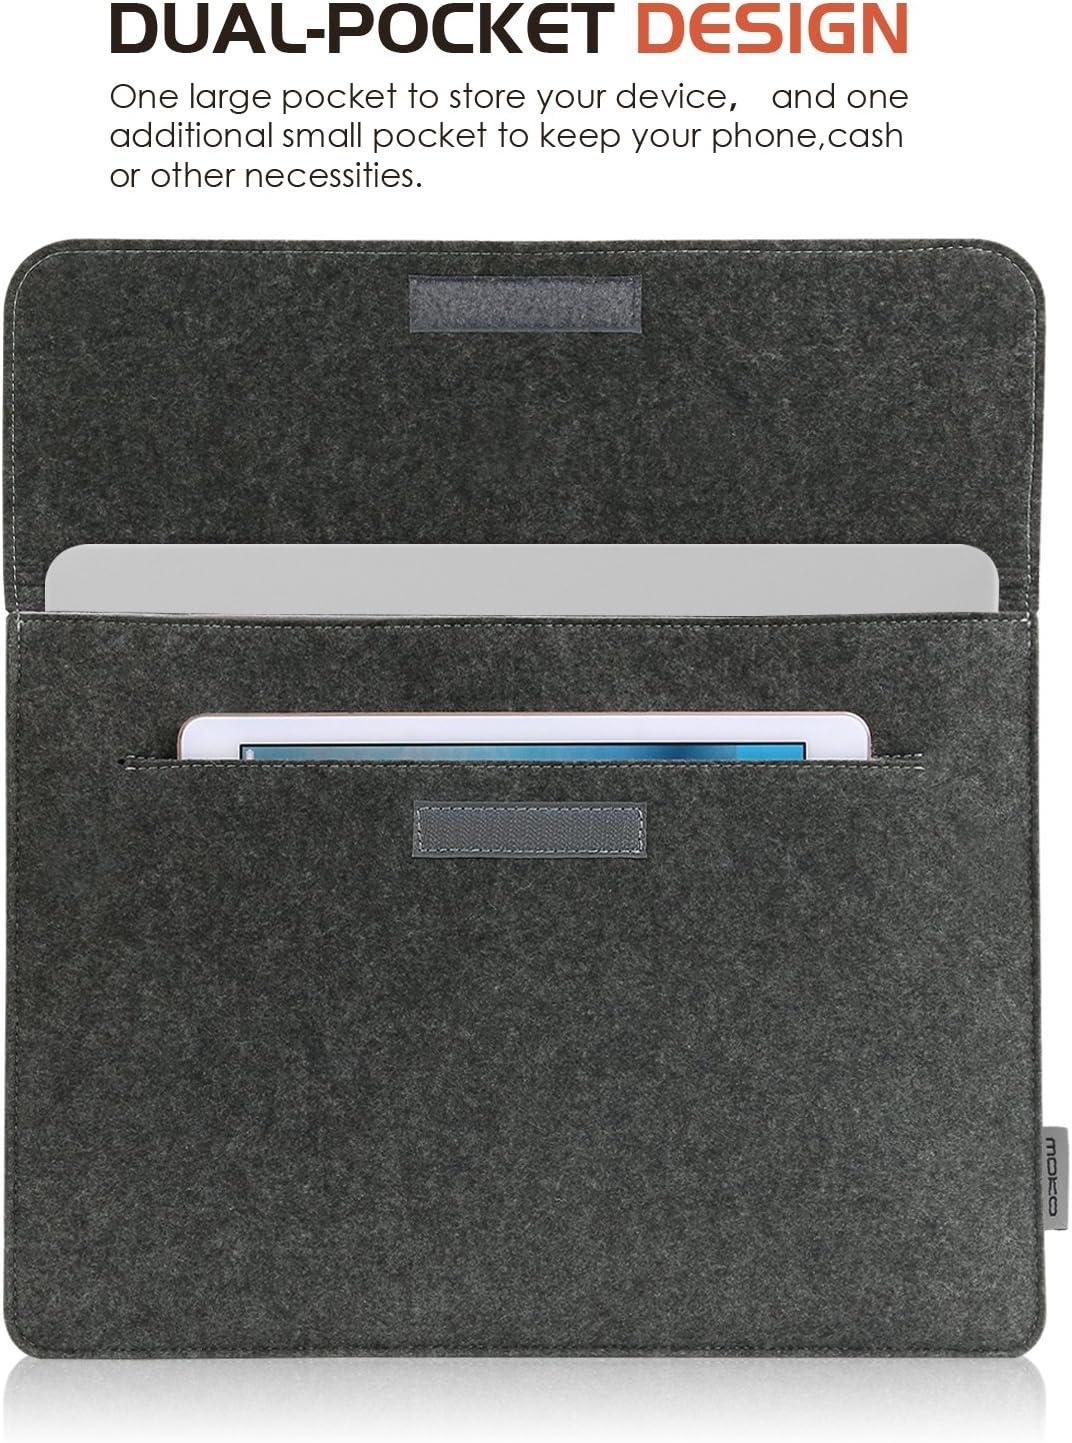 iPad 9.7 Air 3 10.5 Dark Gray S7 Tab S6 Lite Galaxy Tab A 10.1 MoKo 10-11 Inch Felt Tablet Sleeve Carrying Case with Small Bag Fits iPad Pro 11 iPad Air 4 10.9 iPad 8th 7th Generation 10.2